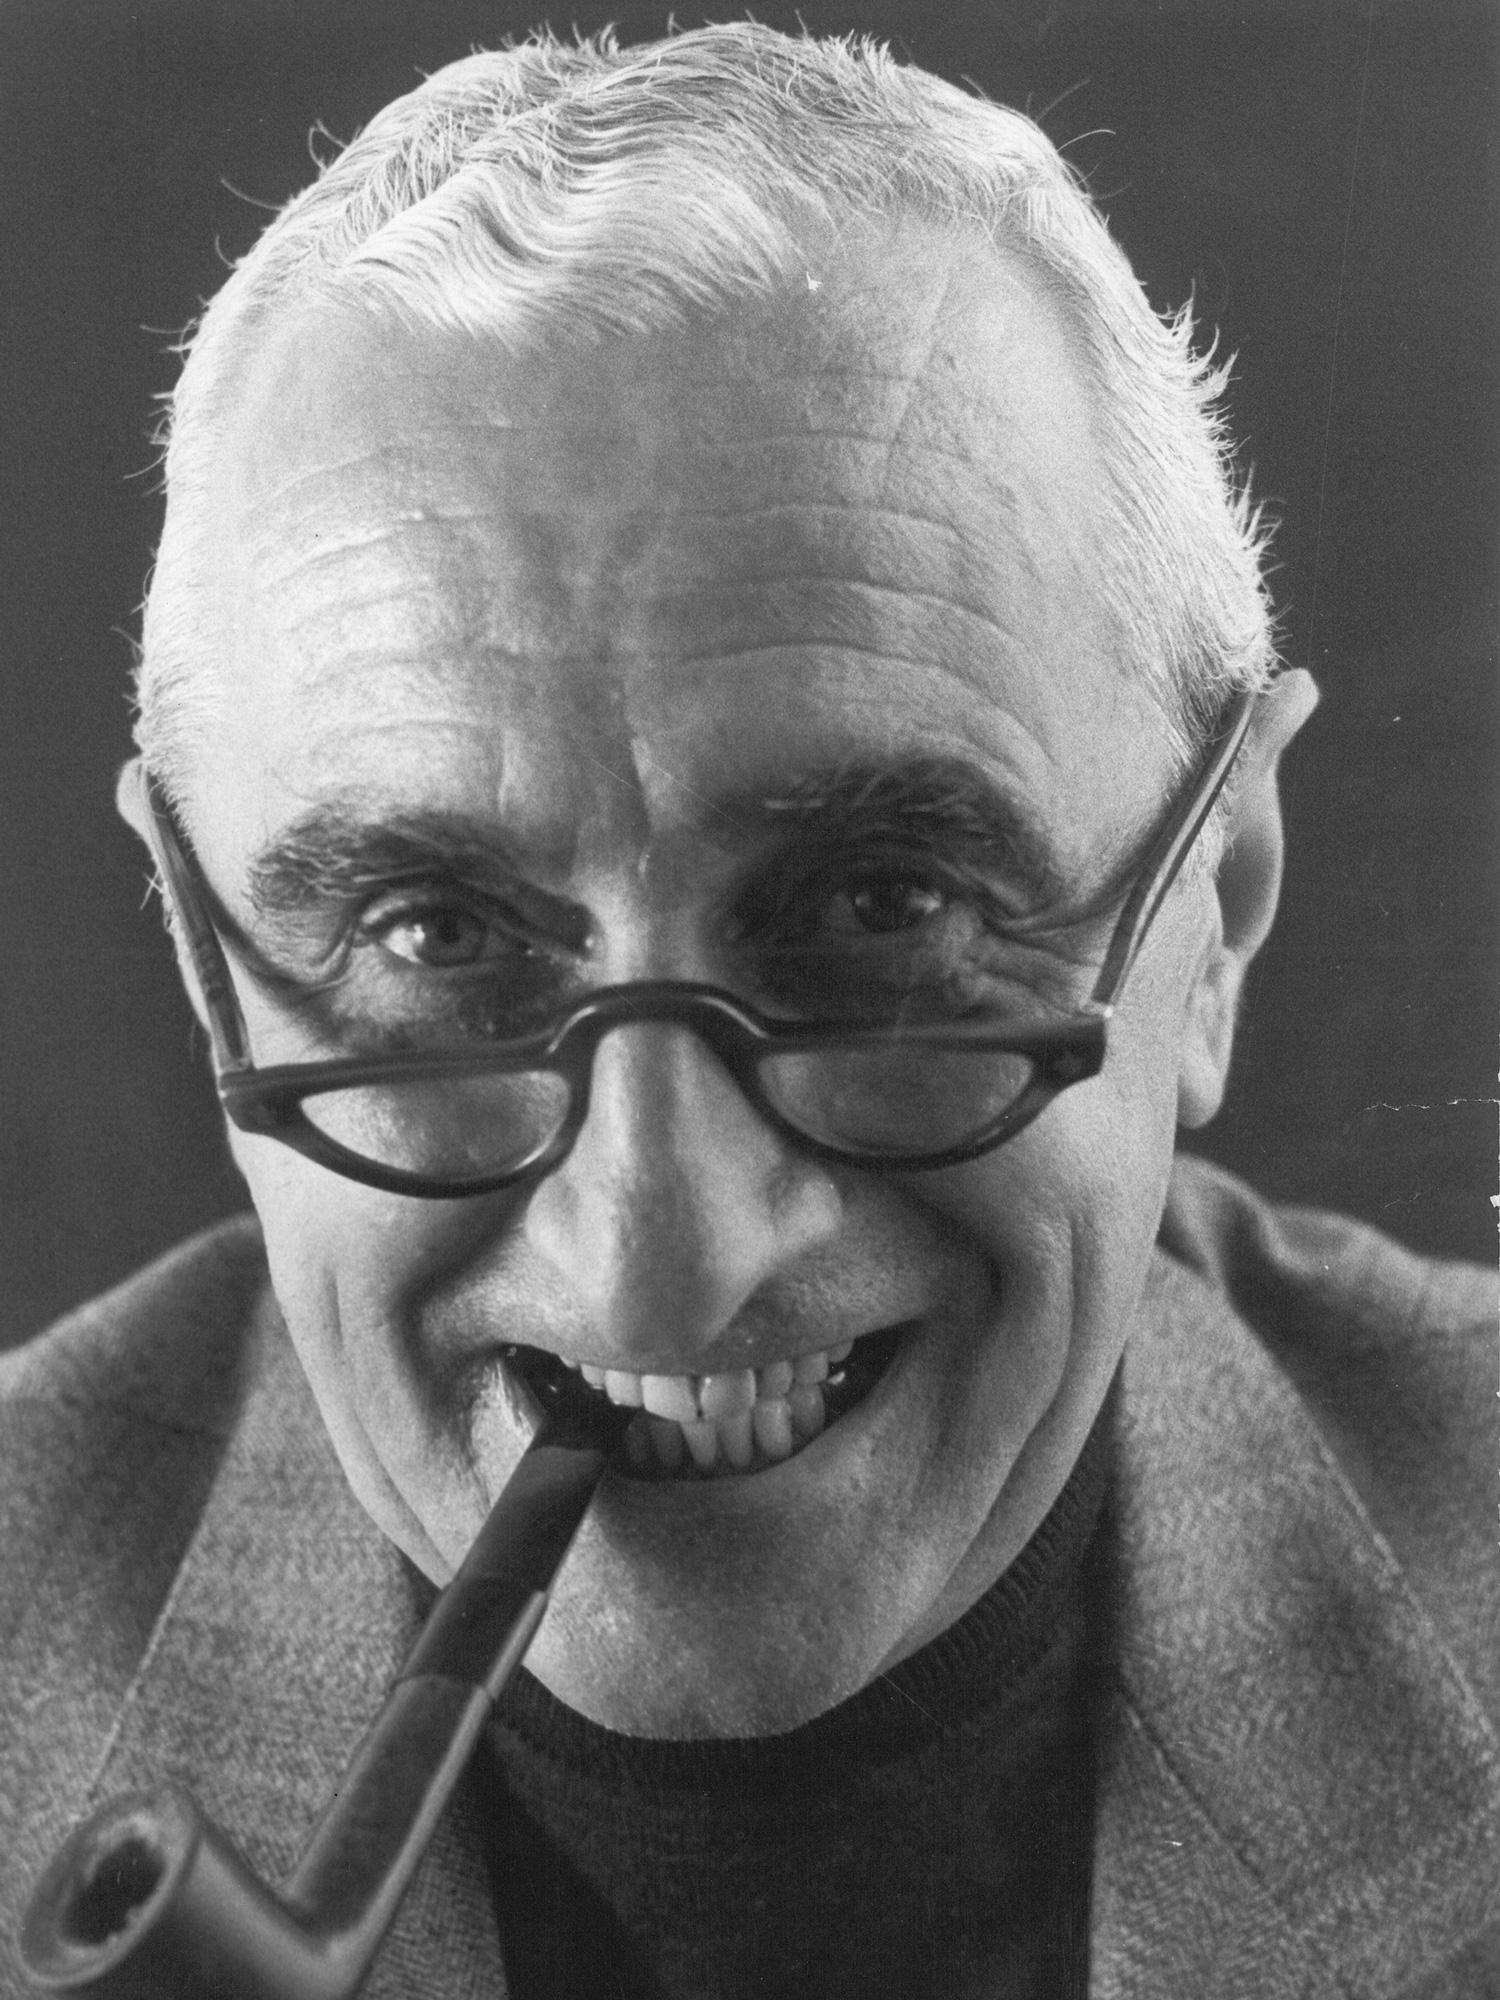 Portrait of architect and designer Luigi Caccia Dominioni whose interiors and furniture helped shape post-war Milan. Photo c/o Azucena.